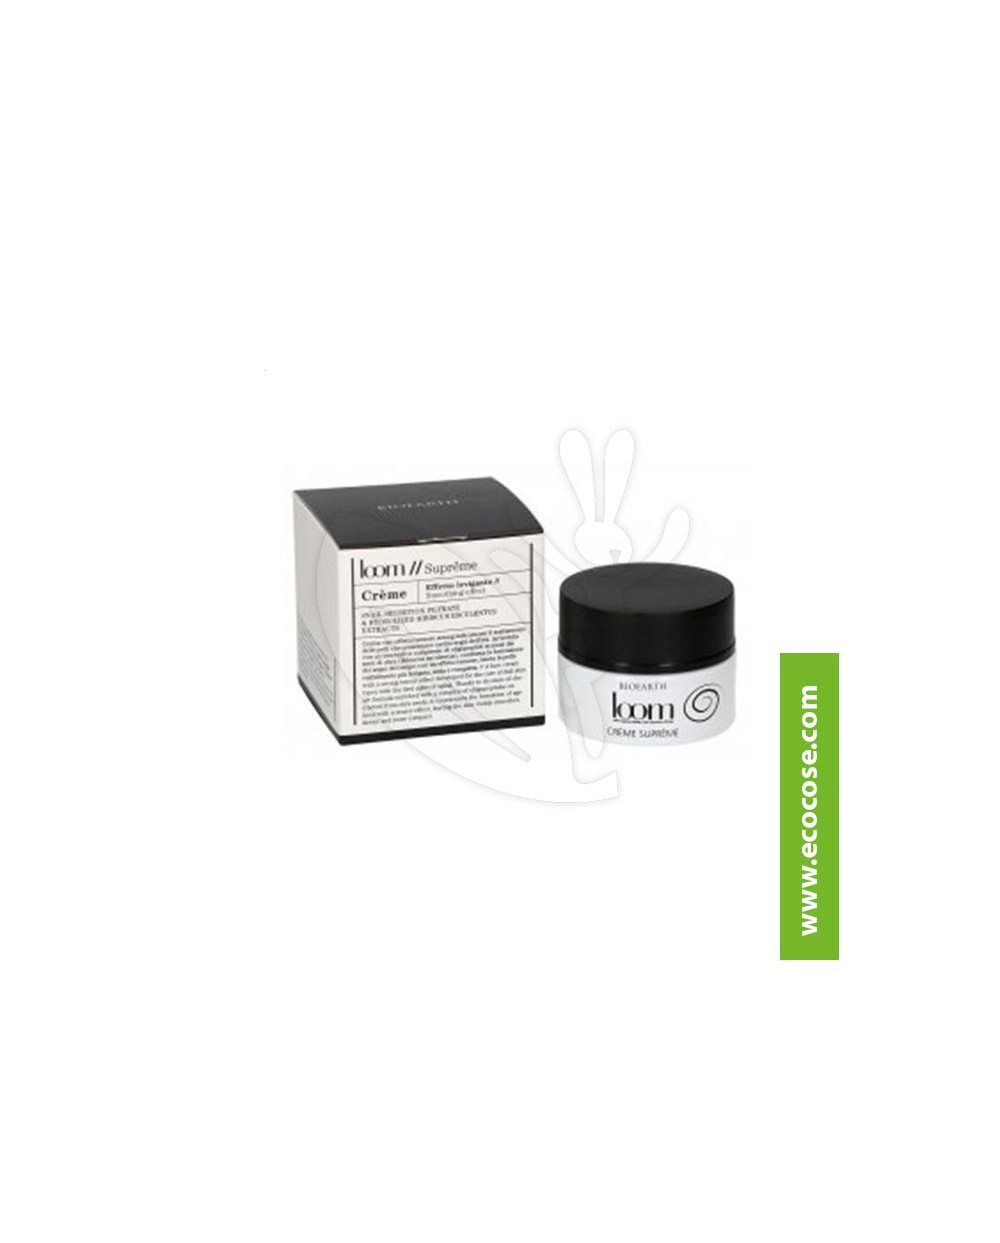 Bioearth - Loom Crème Supreme